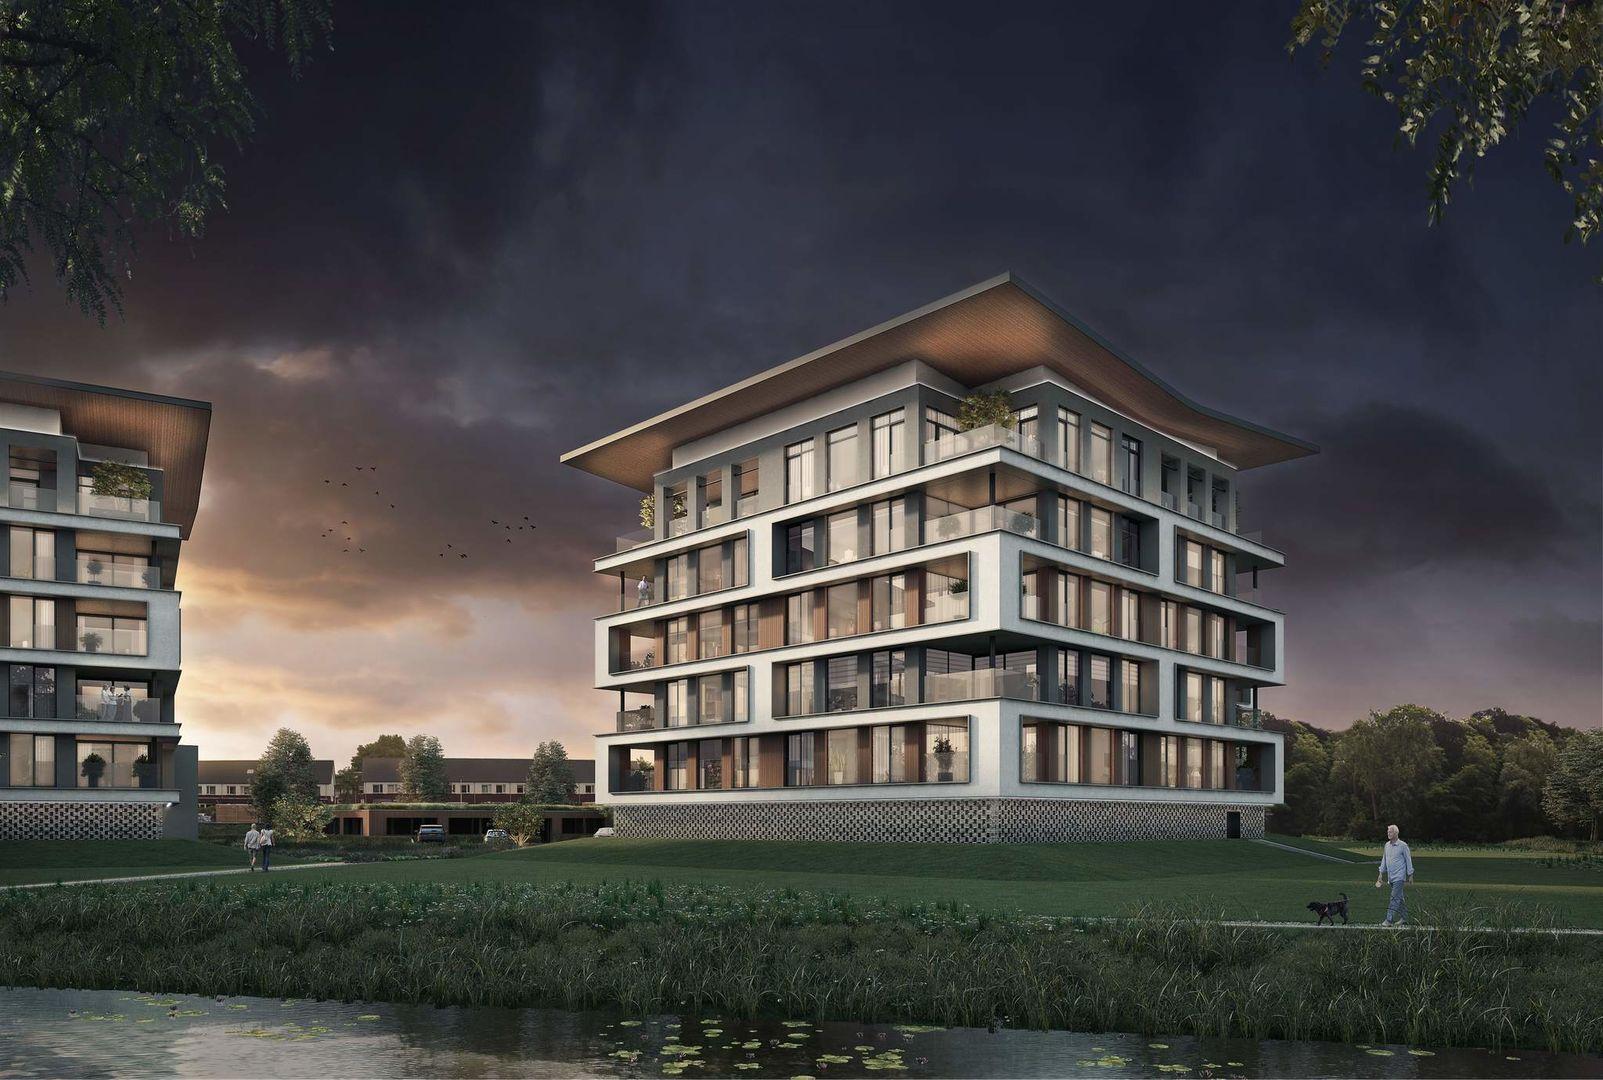 Keuken Badkamer Zutphen : De clercqstraat ong penthouse in zutphen